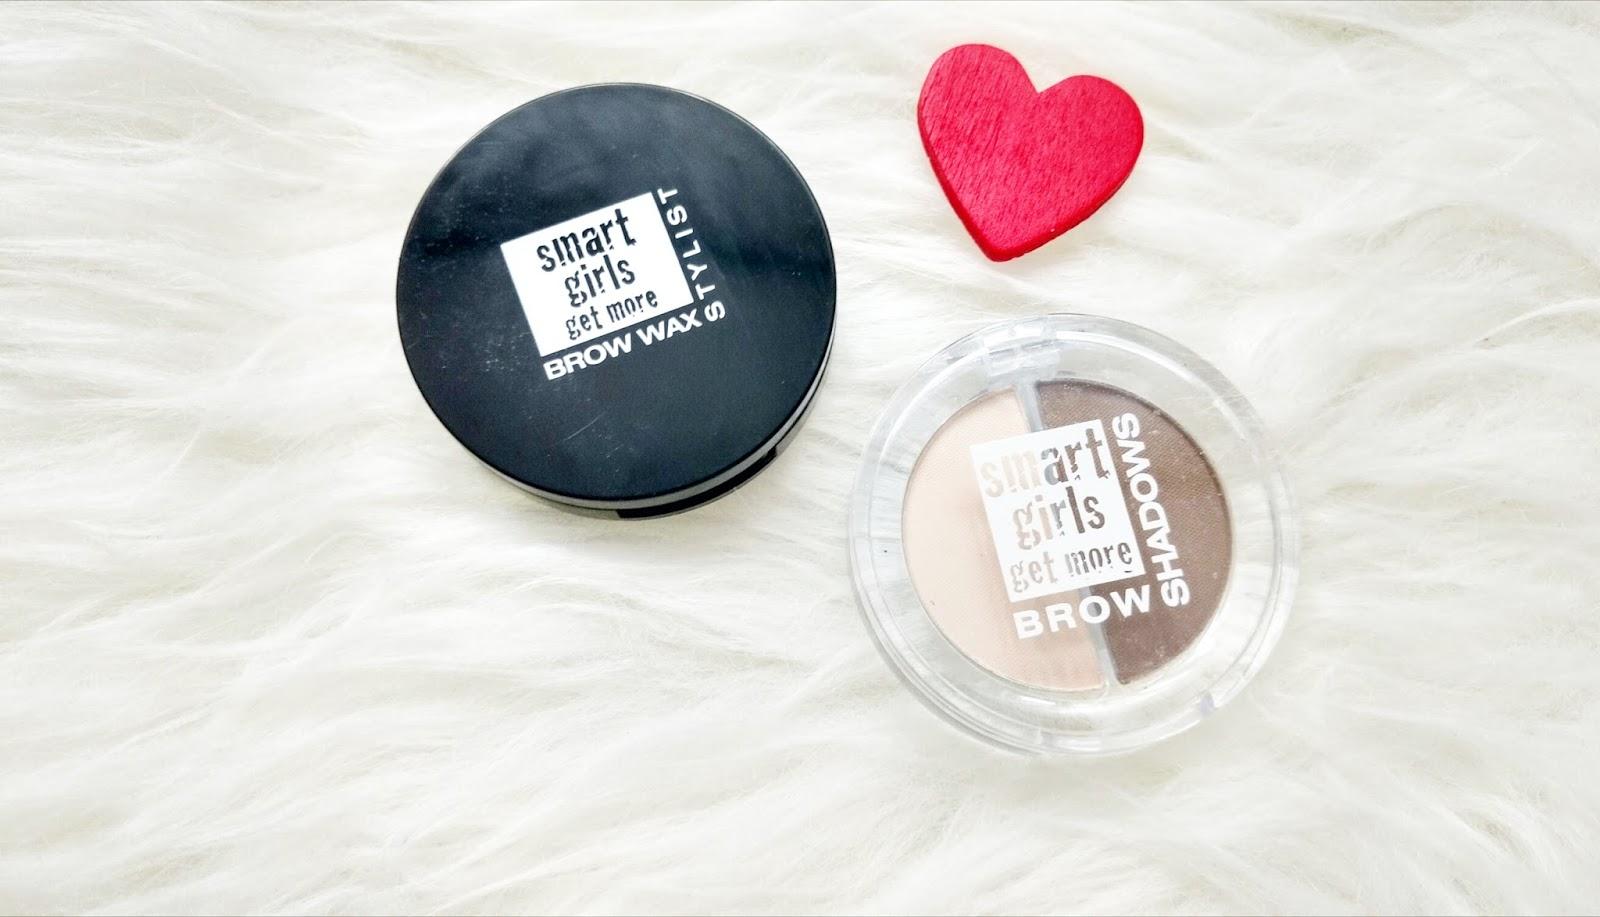 Smart Girls Get More-cień oraz wosk do brwi